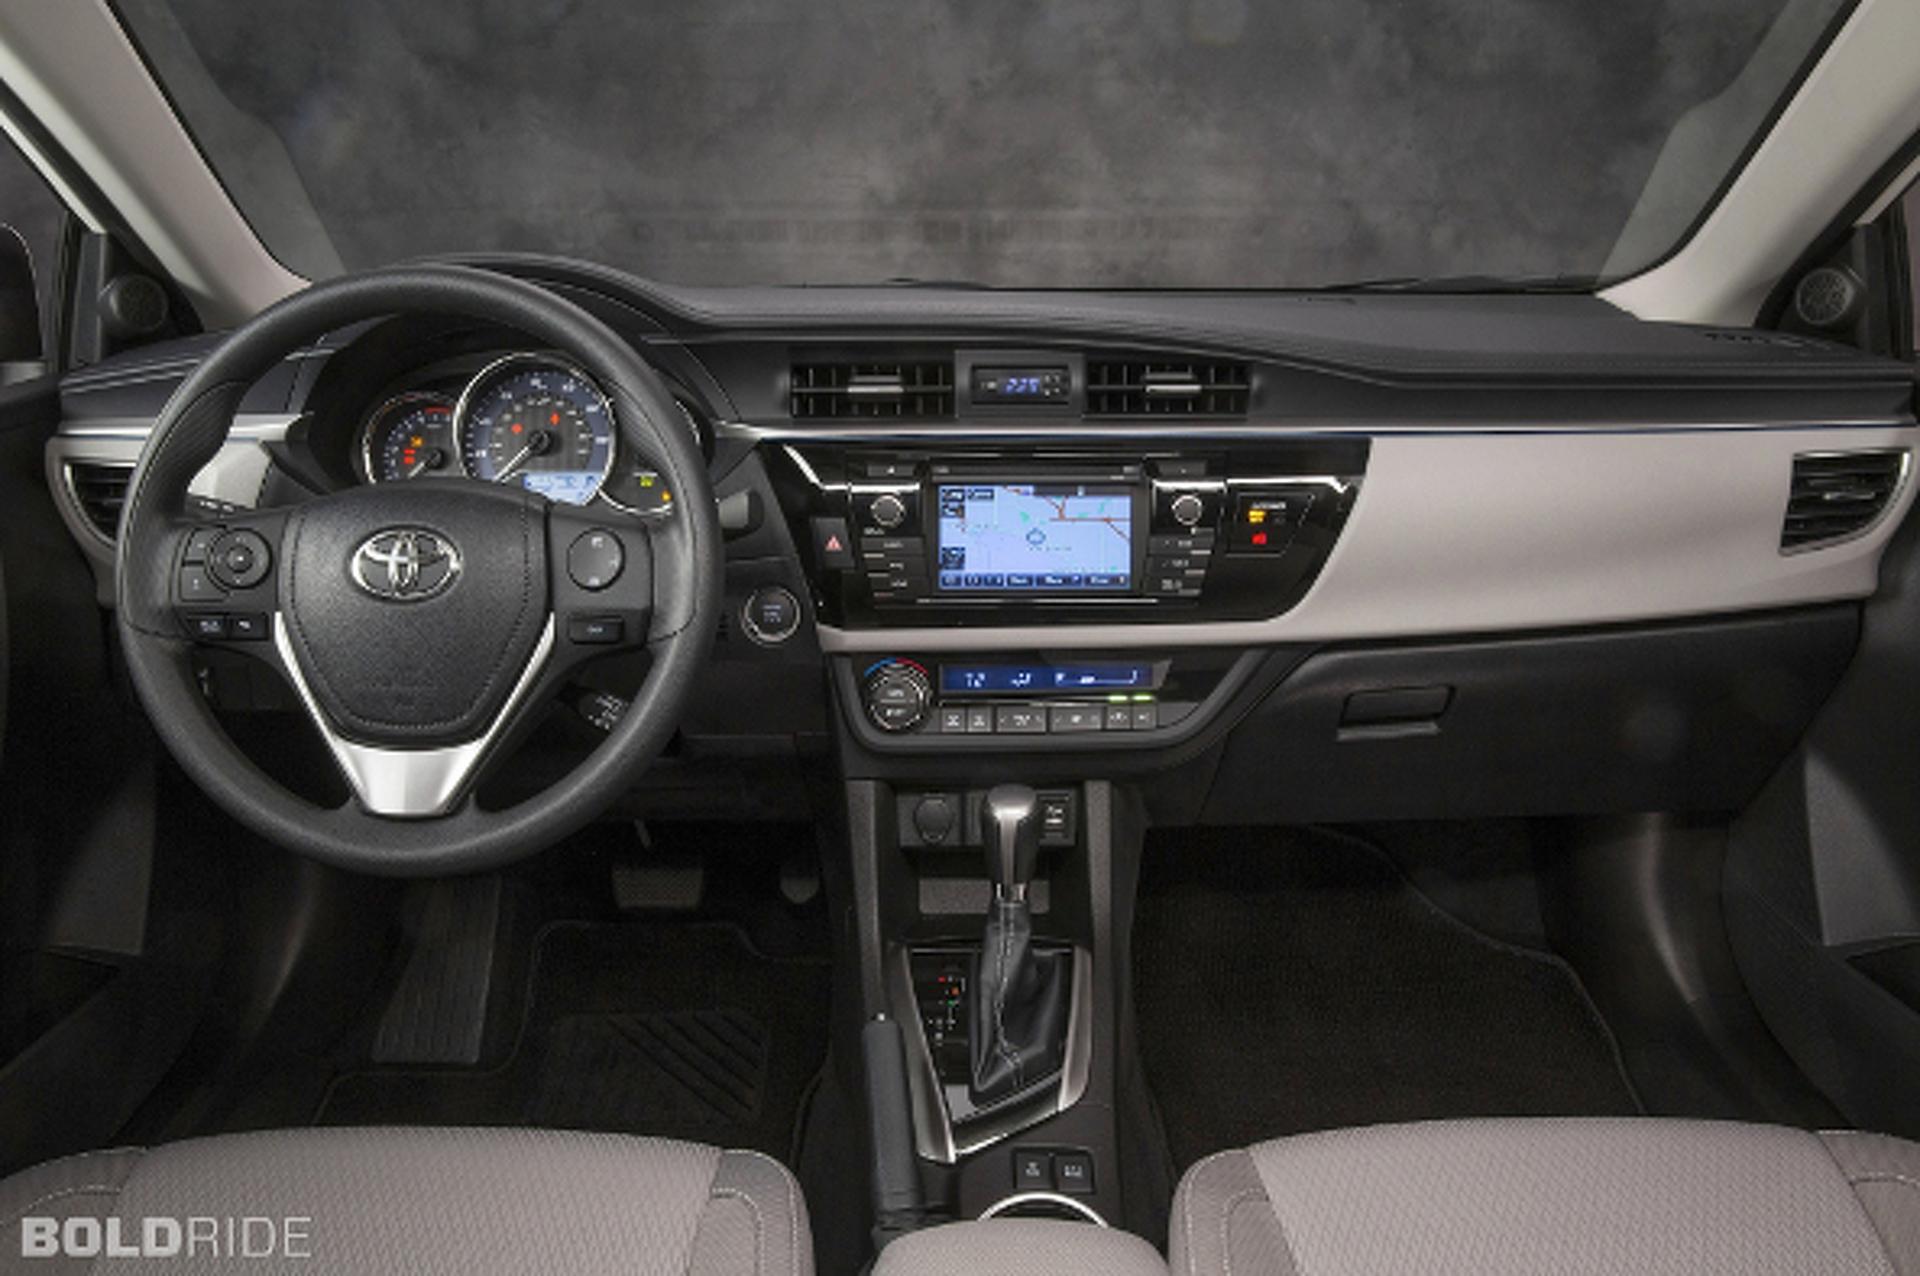 2014 Toyota Corolla: Finally Redesigned